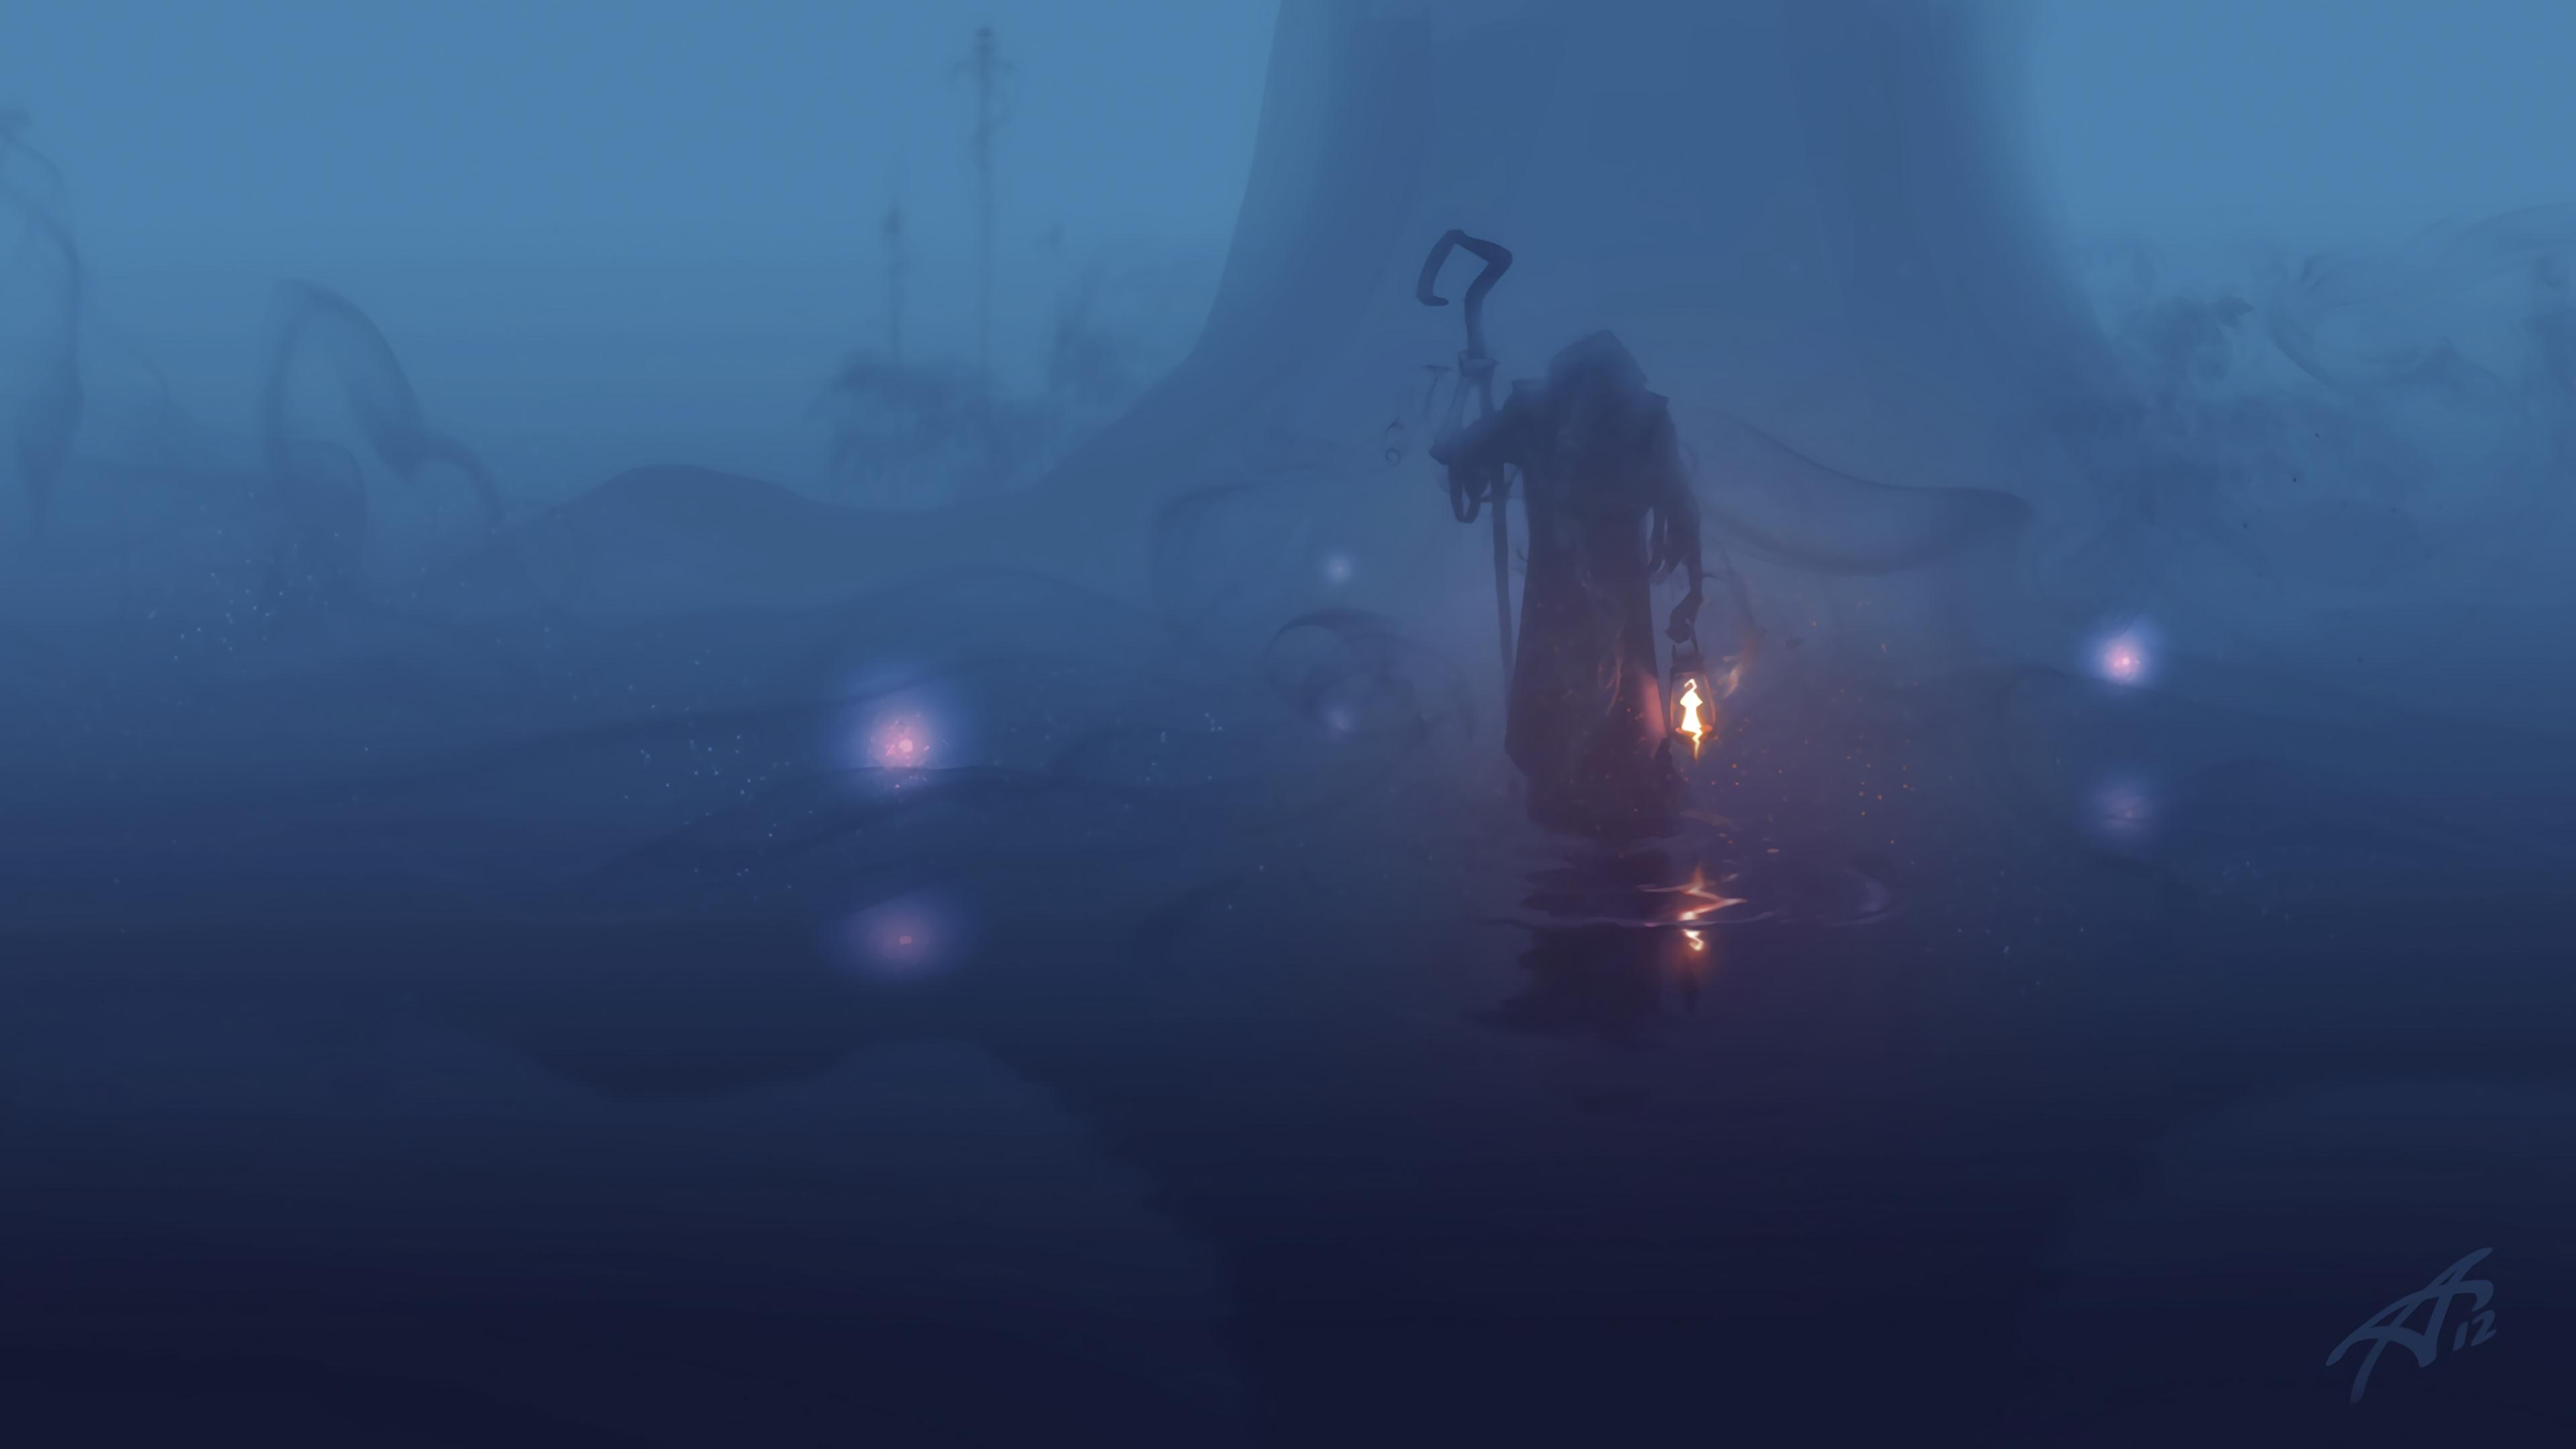 wanderer fog mantle dark gloomy lamp 4k 1541971215 - wanderer, fog, mantle, dark, gloomy, lamp 4k - wanderer, mantle, fog